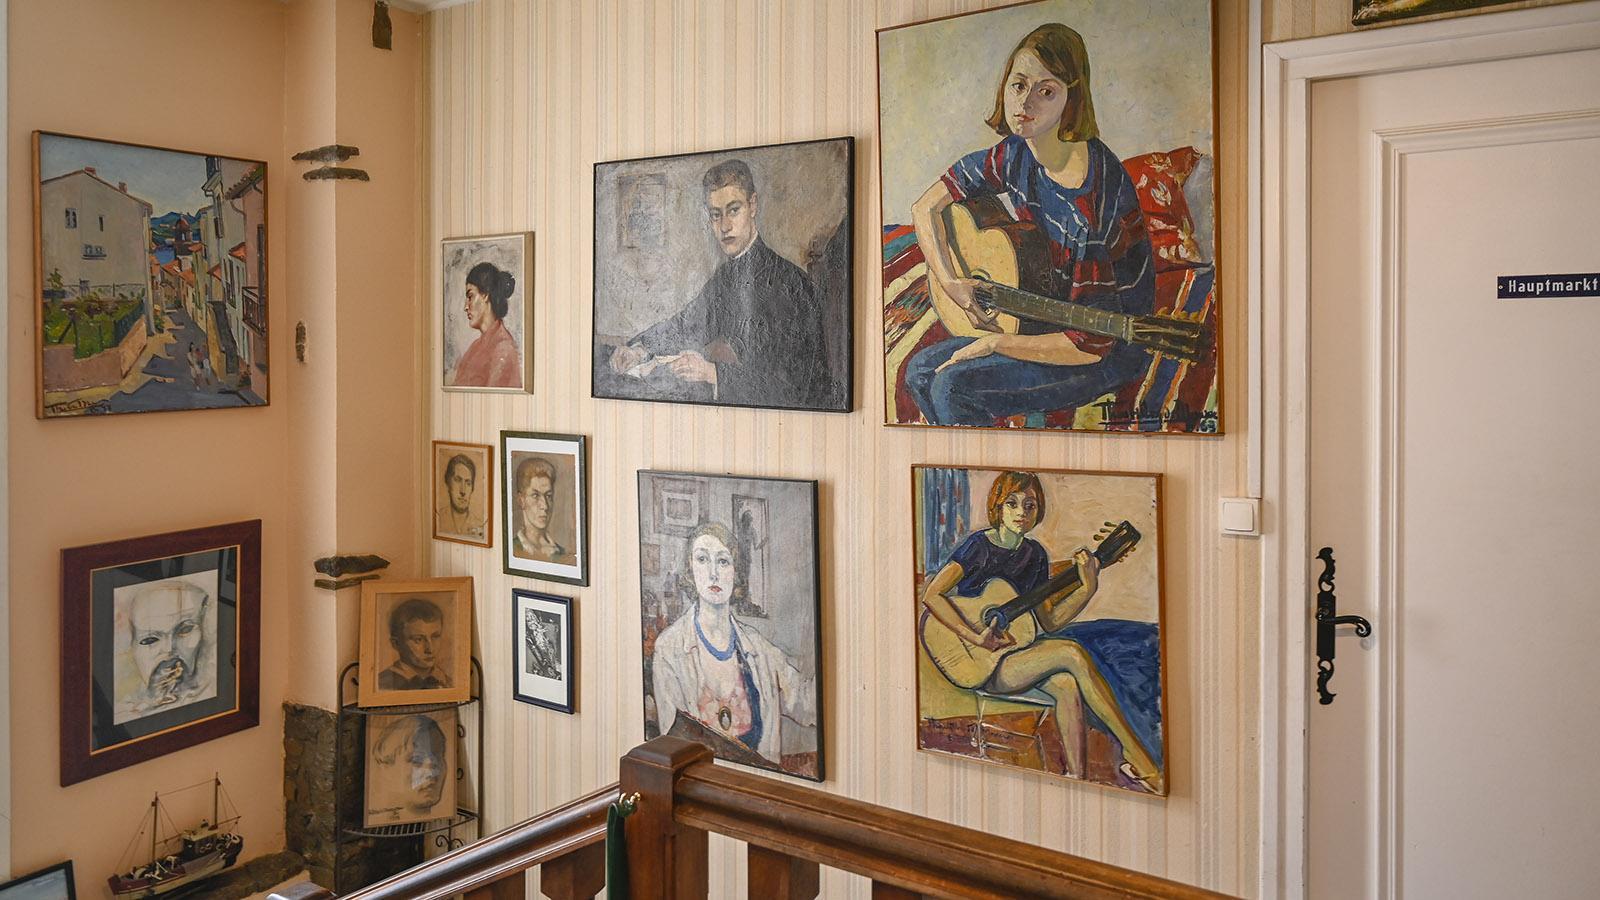 F_Agde_Madeleine Thoubillon de Moncroc. Gemälde im Treppenhaus. Foto: Hilke Maunder